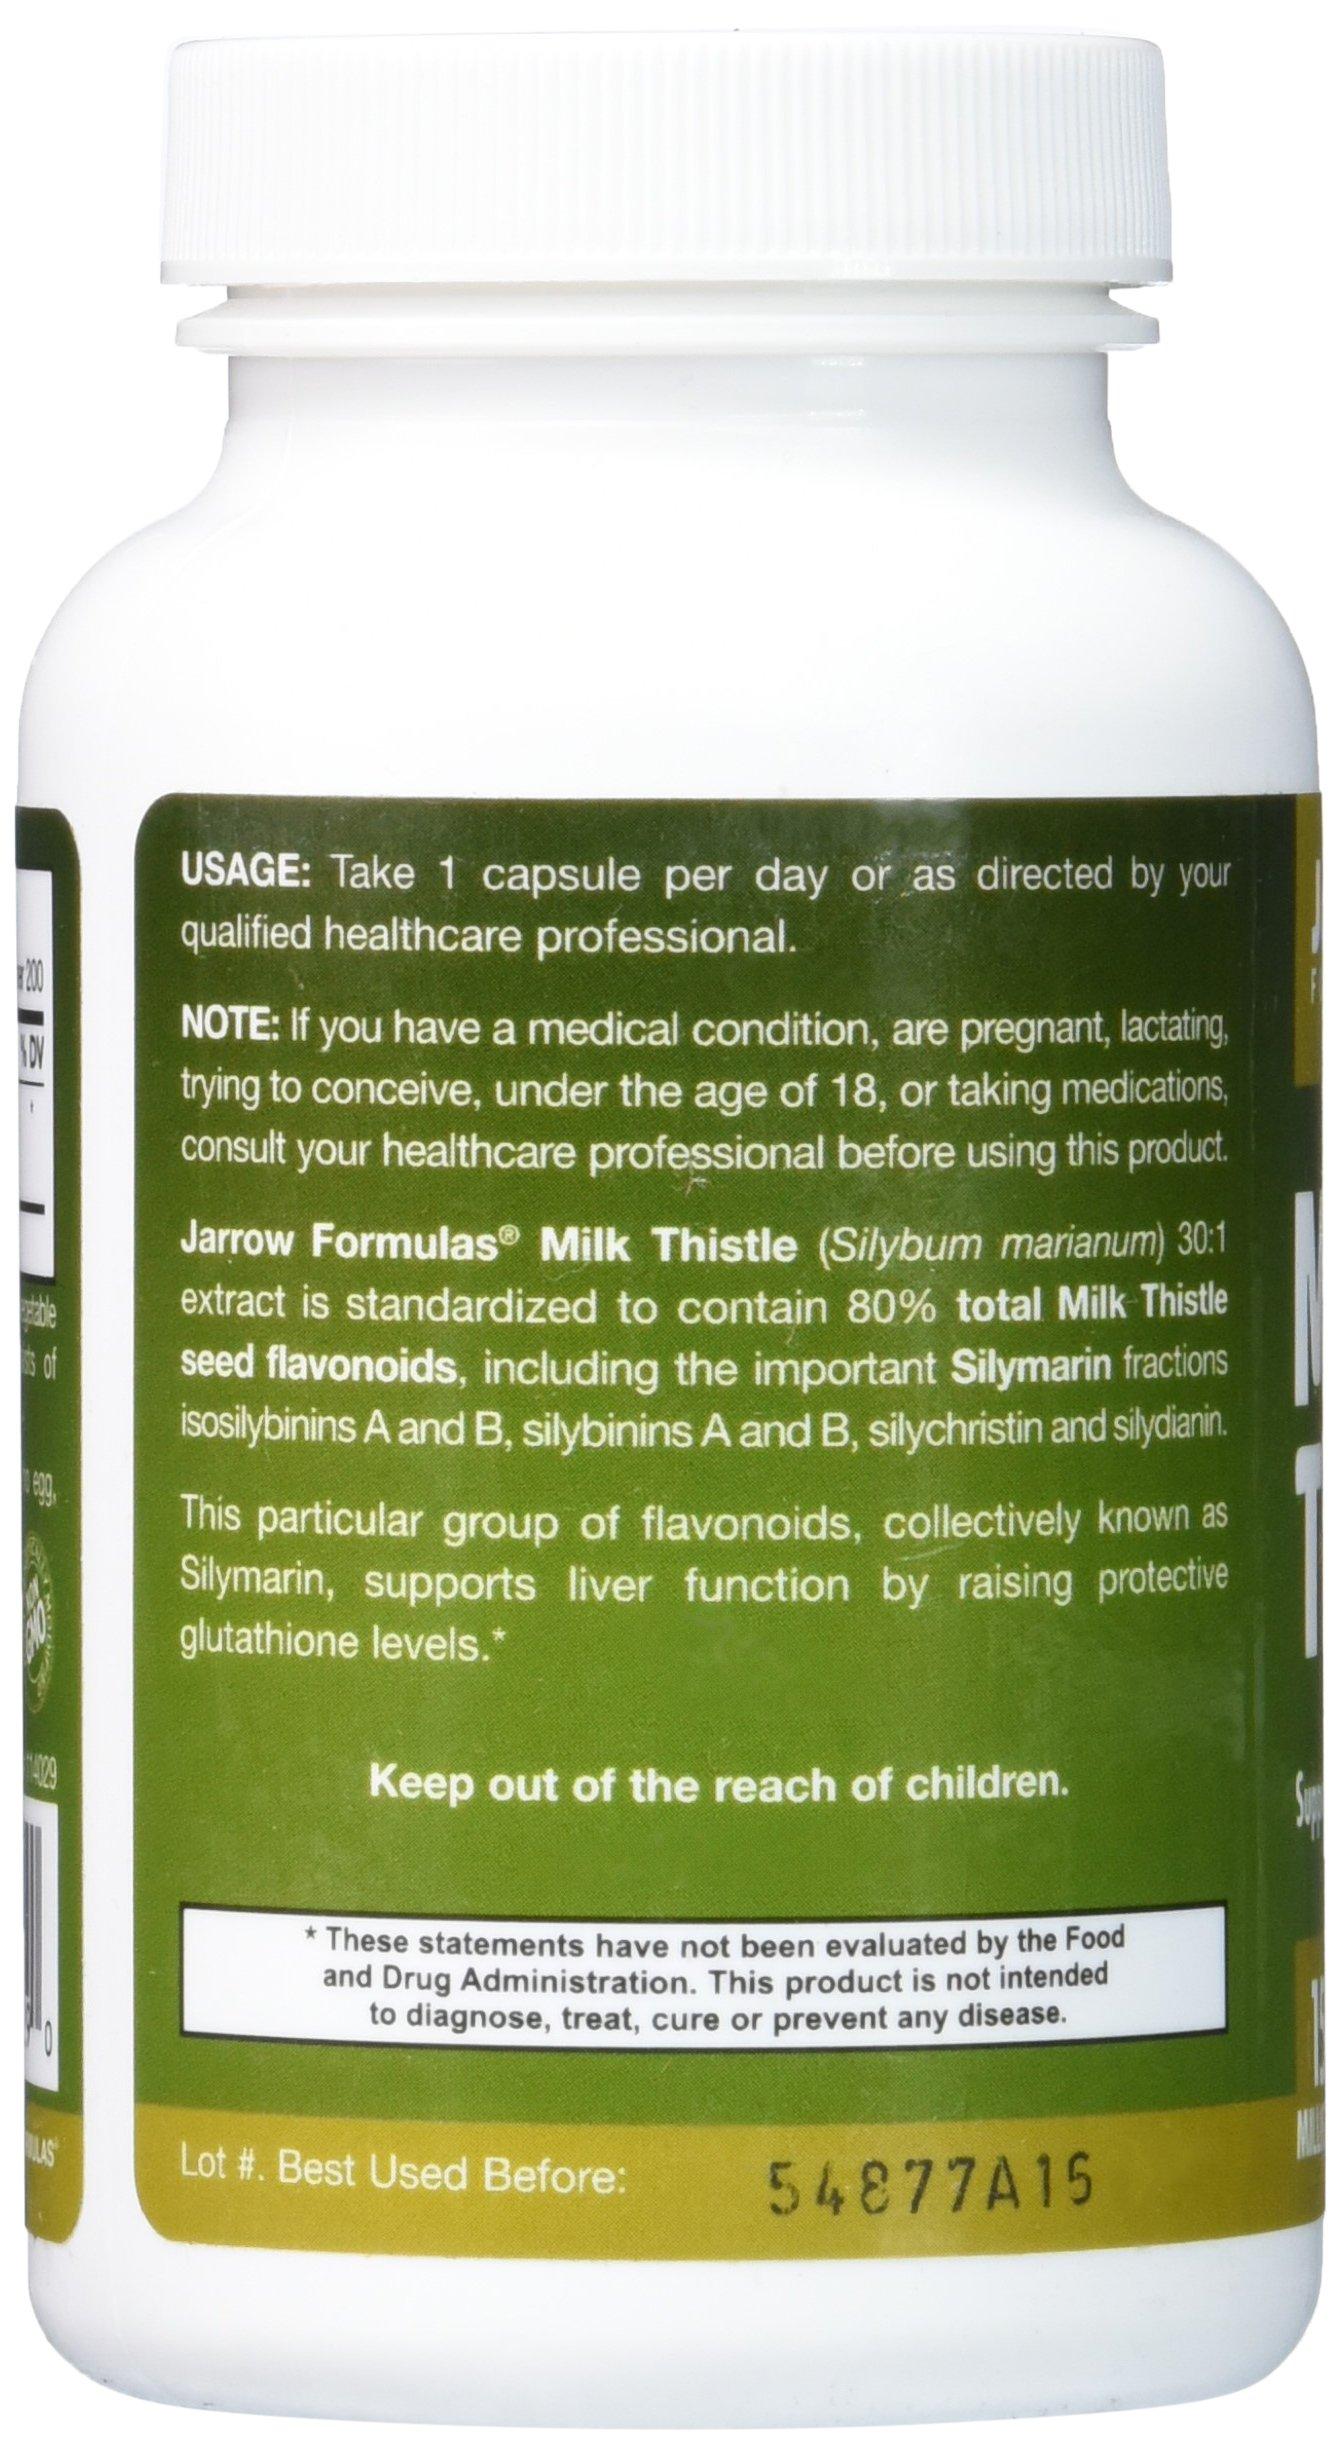 Jarrow Formulas Milk Thistle (Silymarin Marianum), Promotes Liver Health, 150 mg per Capsule, 200 Veggie Capsules by Jarrow Formulas (Image #4)